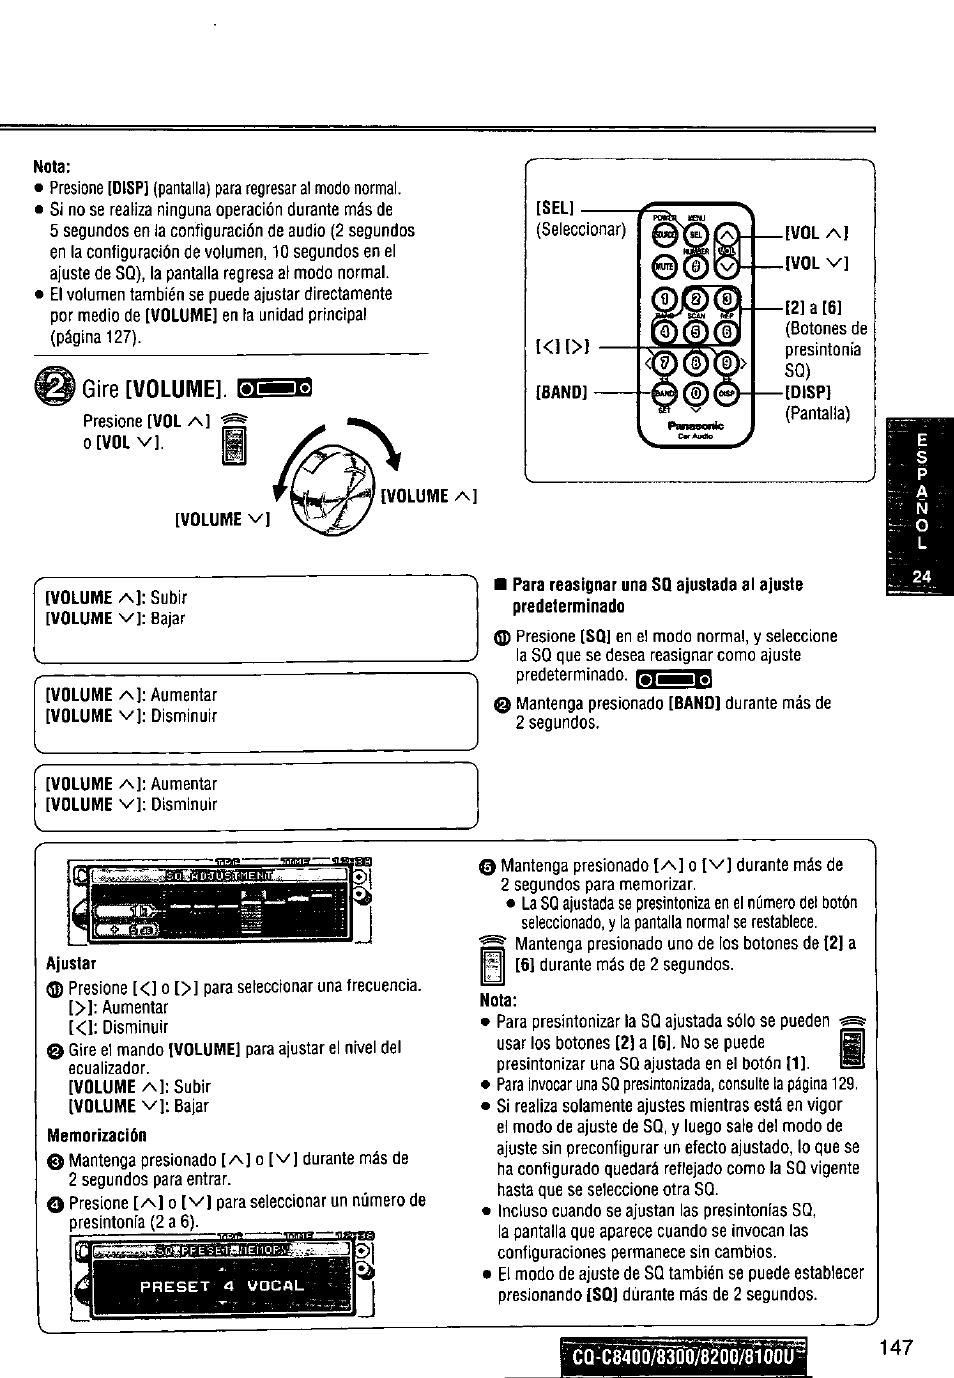 medium resolution of panasonic cq c8300u user manual page 147 176